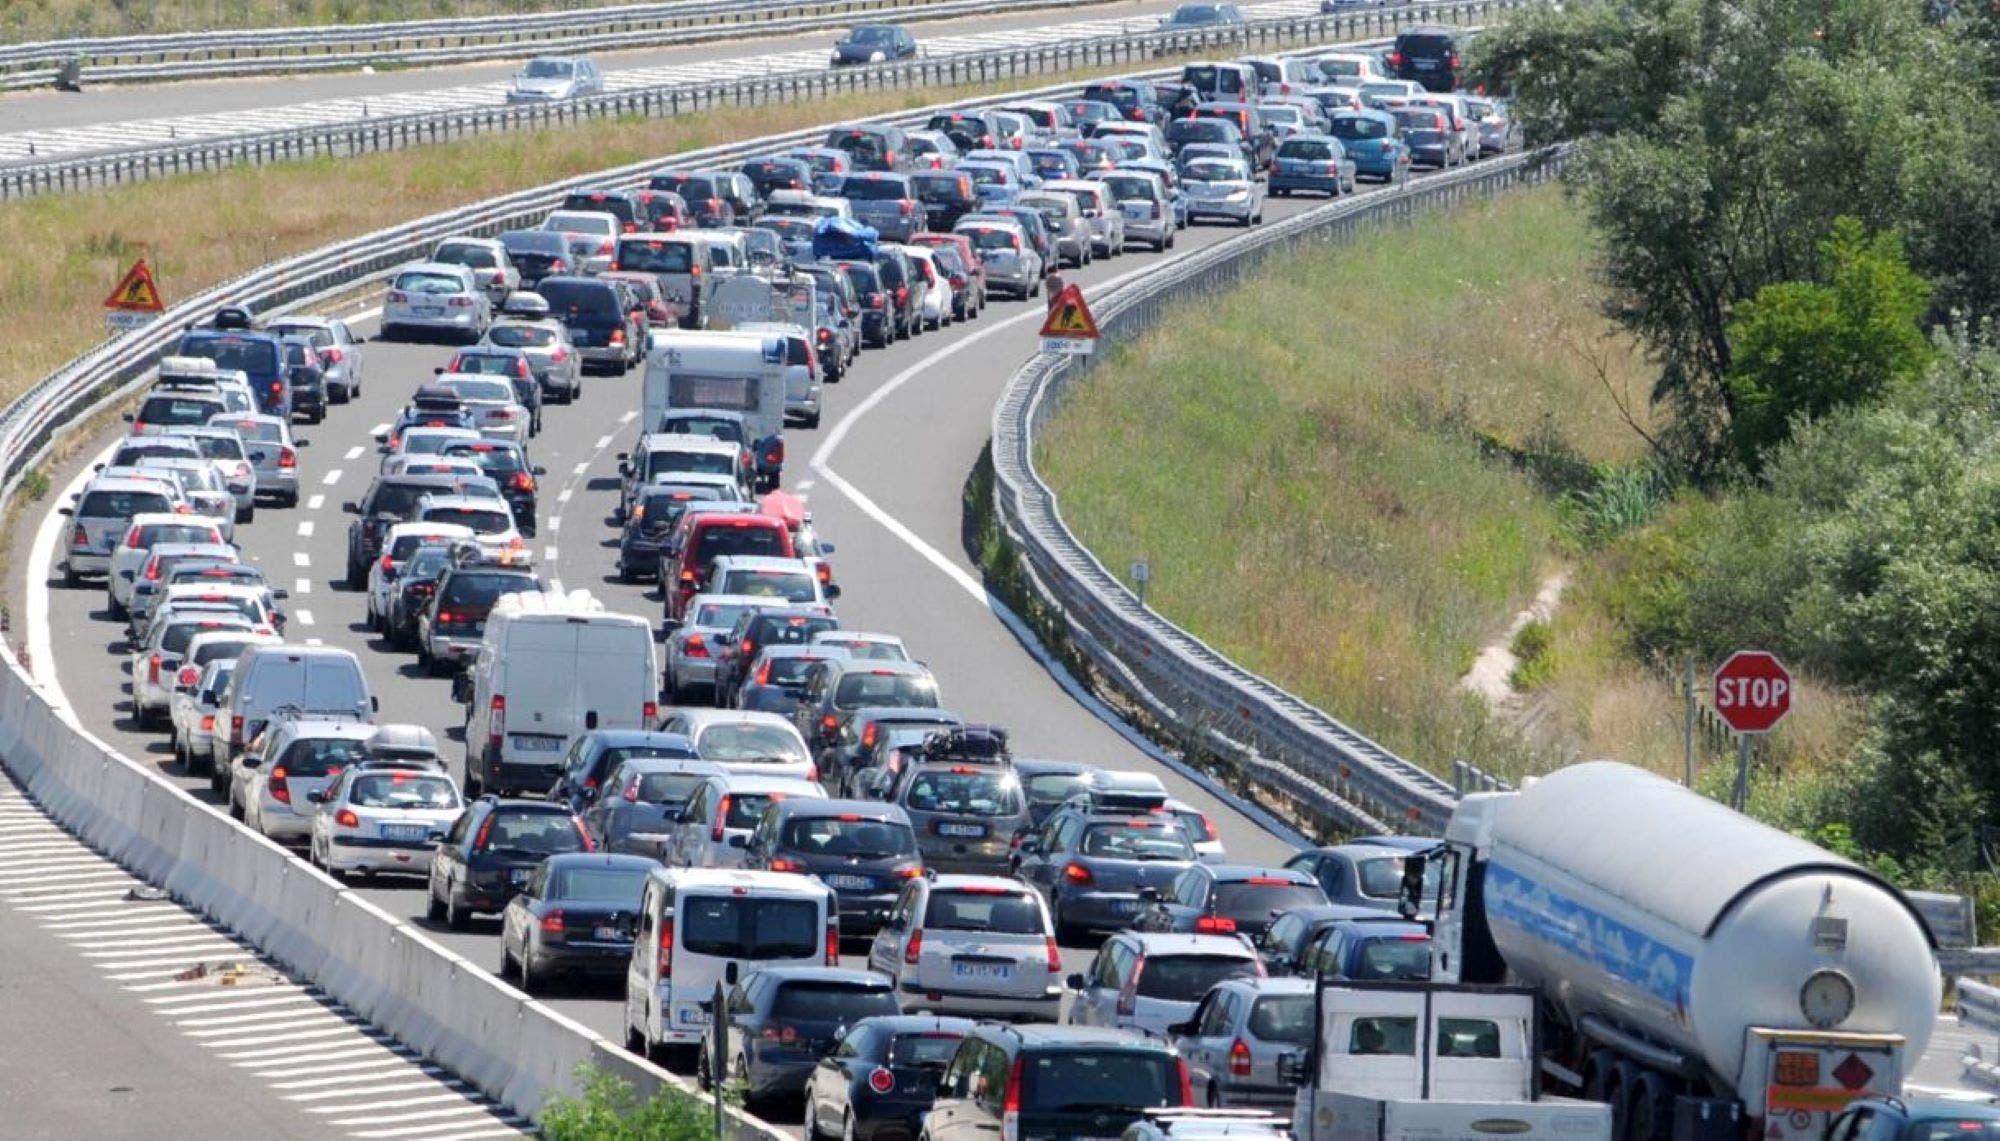 autostrada-code-traffico